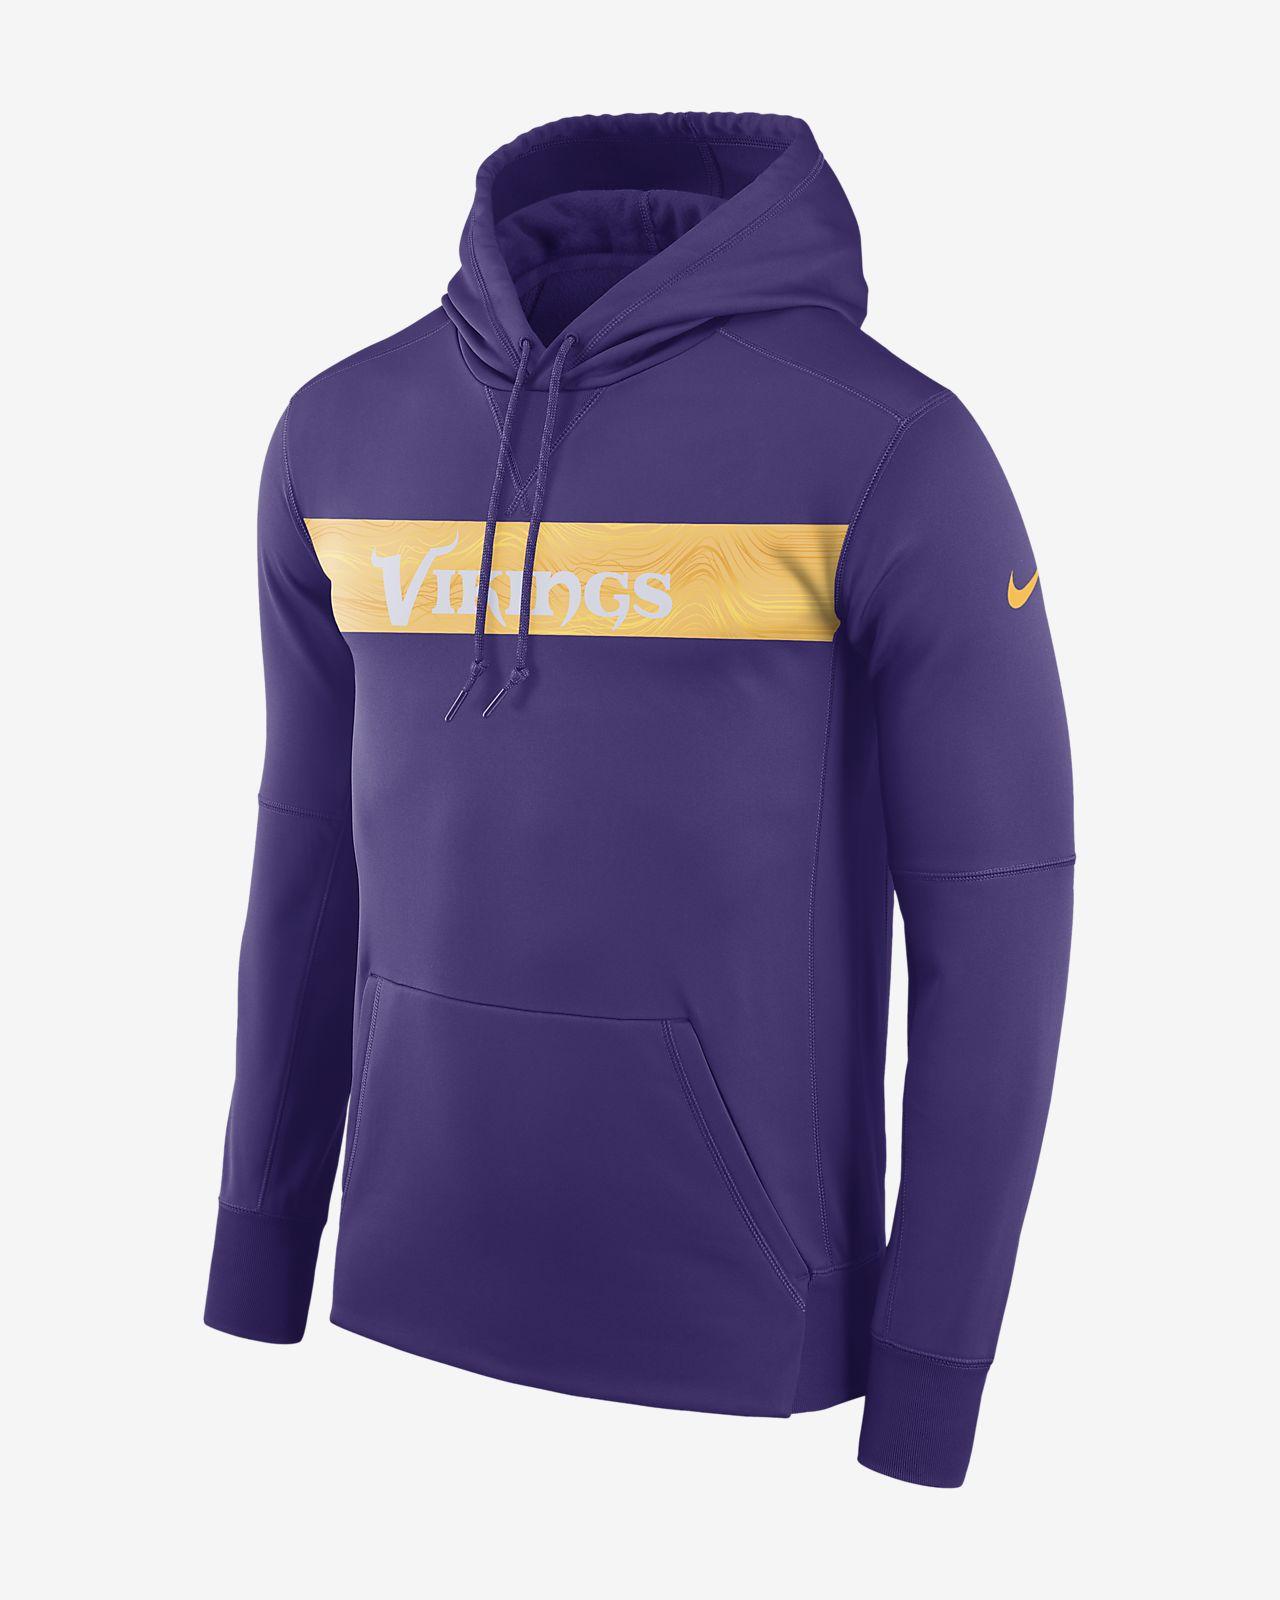 Huvtröja Nike Dri-FIT Therma (NFL Vikings) för män